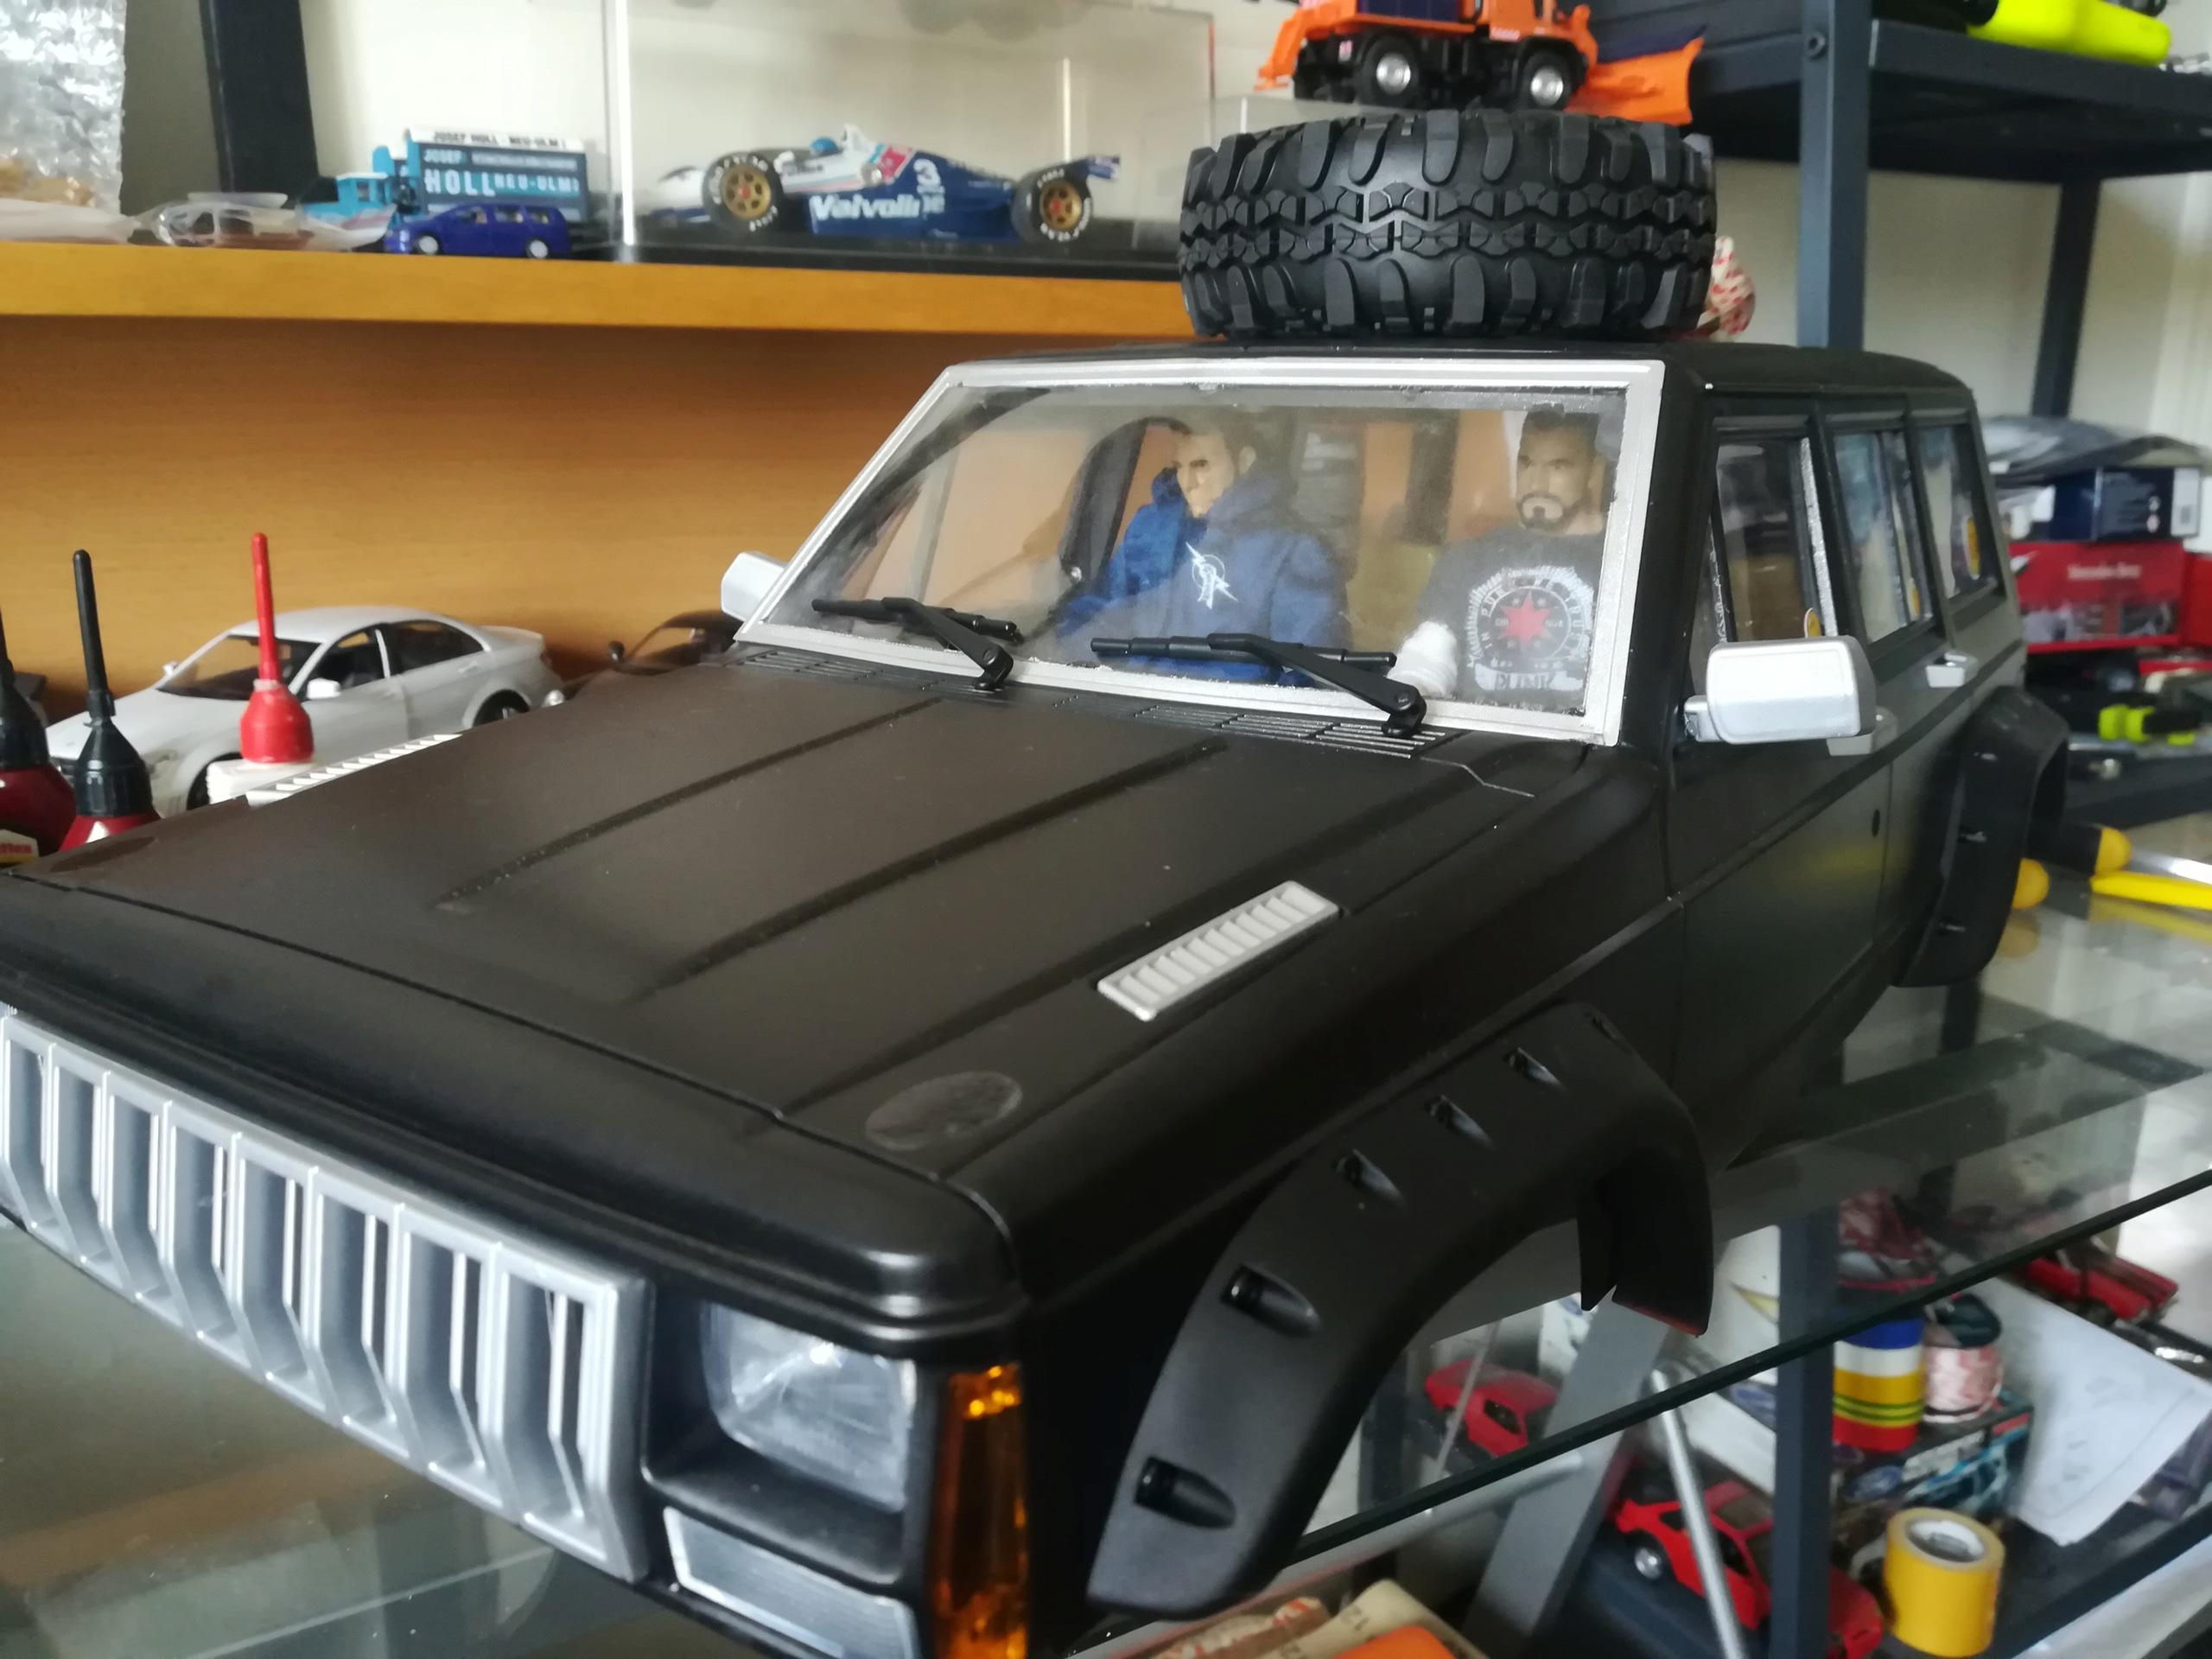 Mon TRX4 sur carrosserie Jeep Cherokee XJ 90's - Page 2 Img_2066